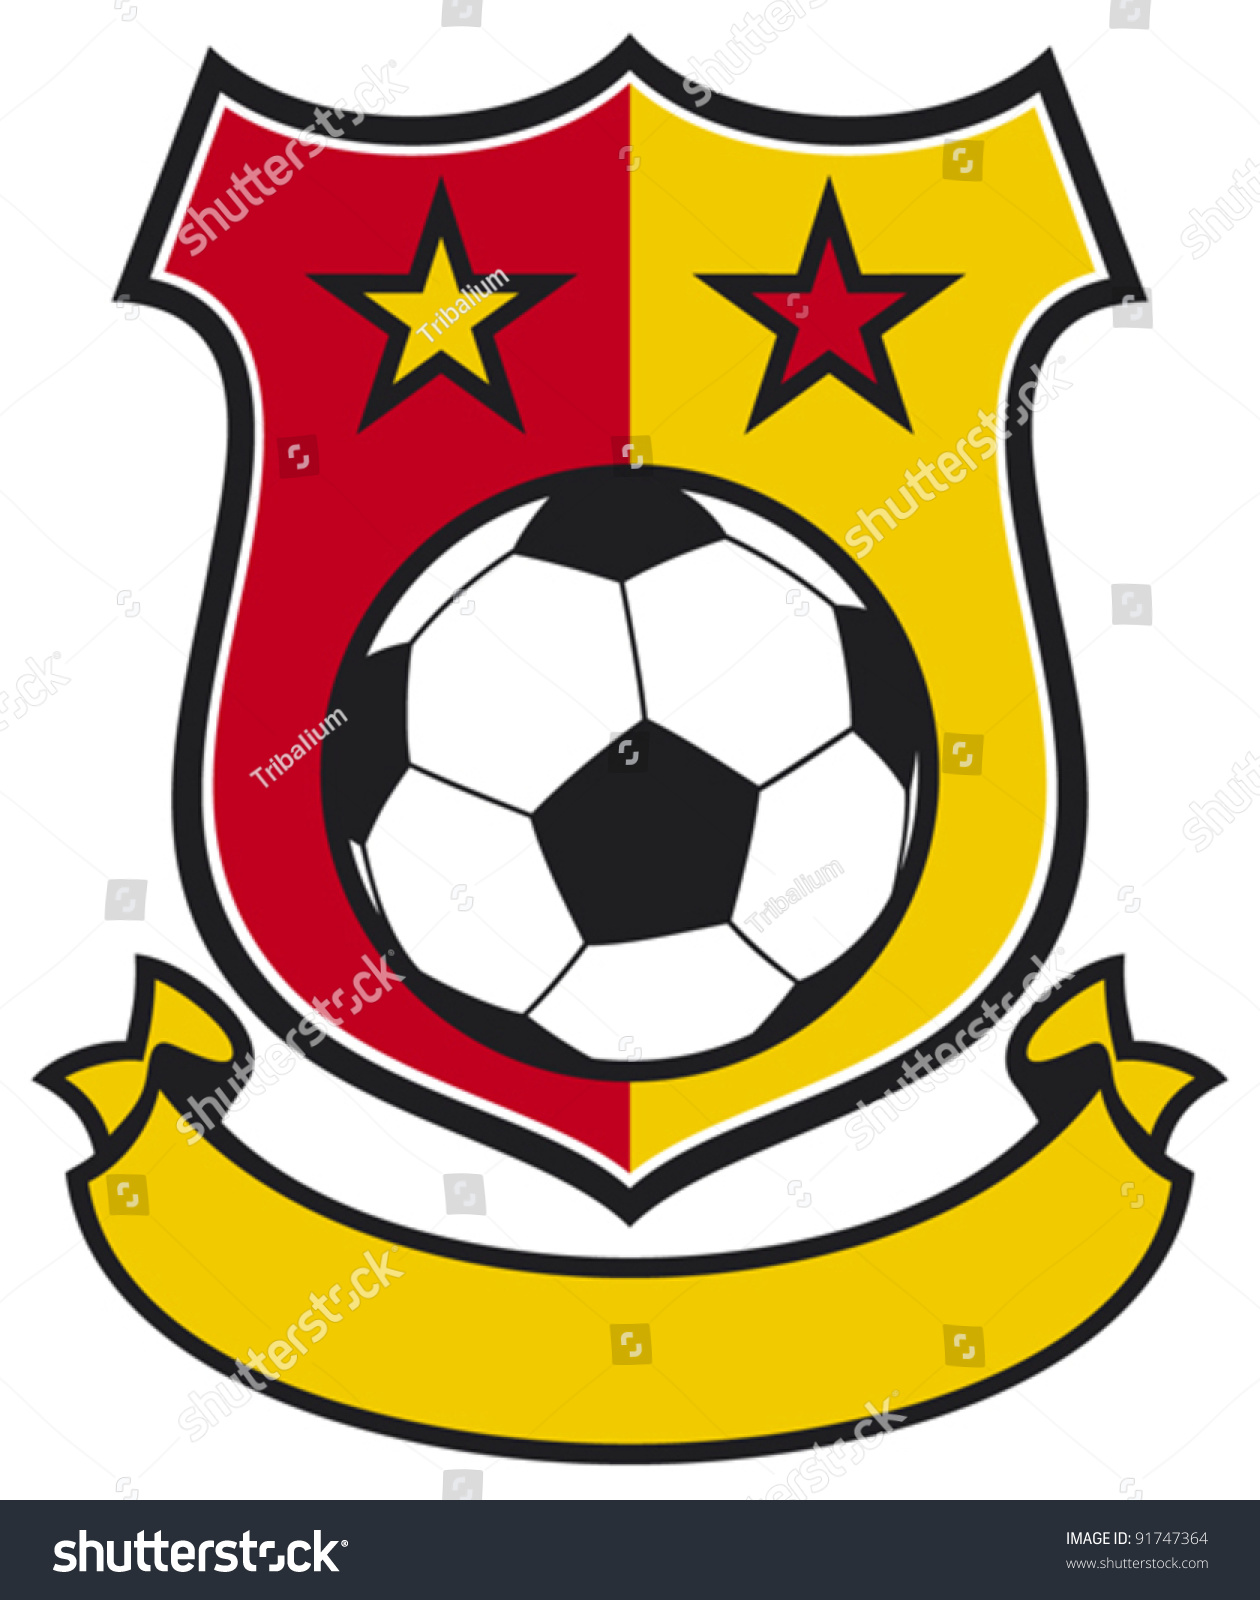 Football Club Soccer Symbol Emblem Design Stock Vector Royalty Free